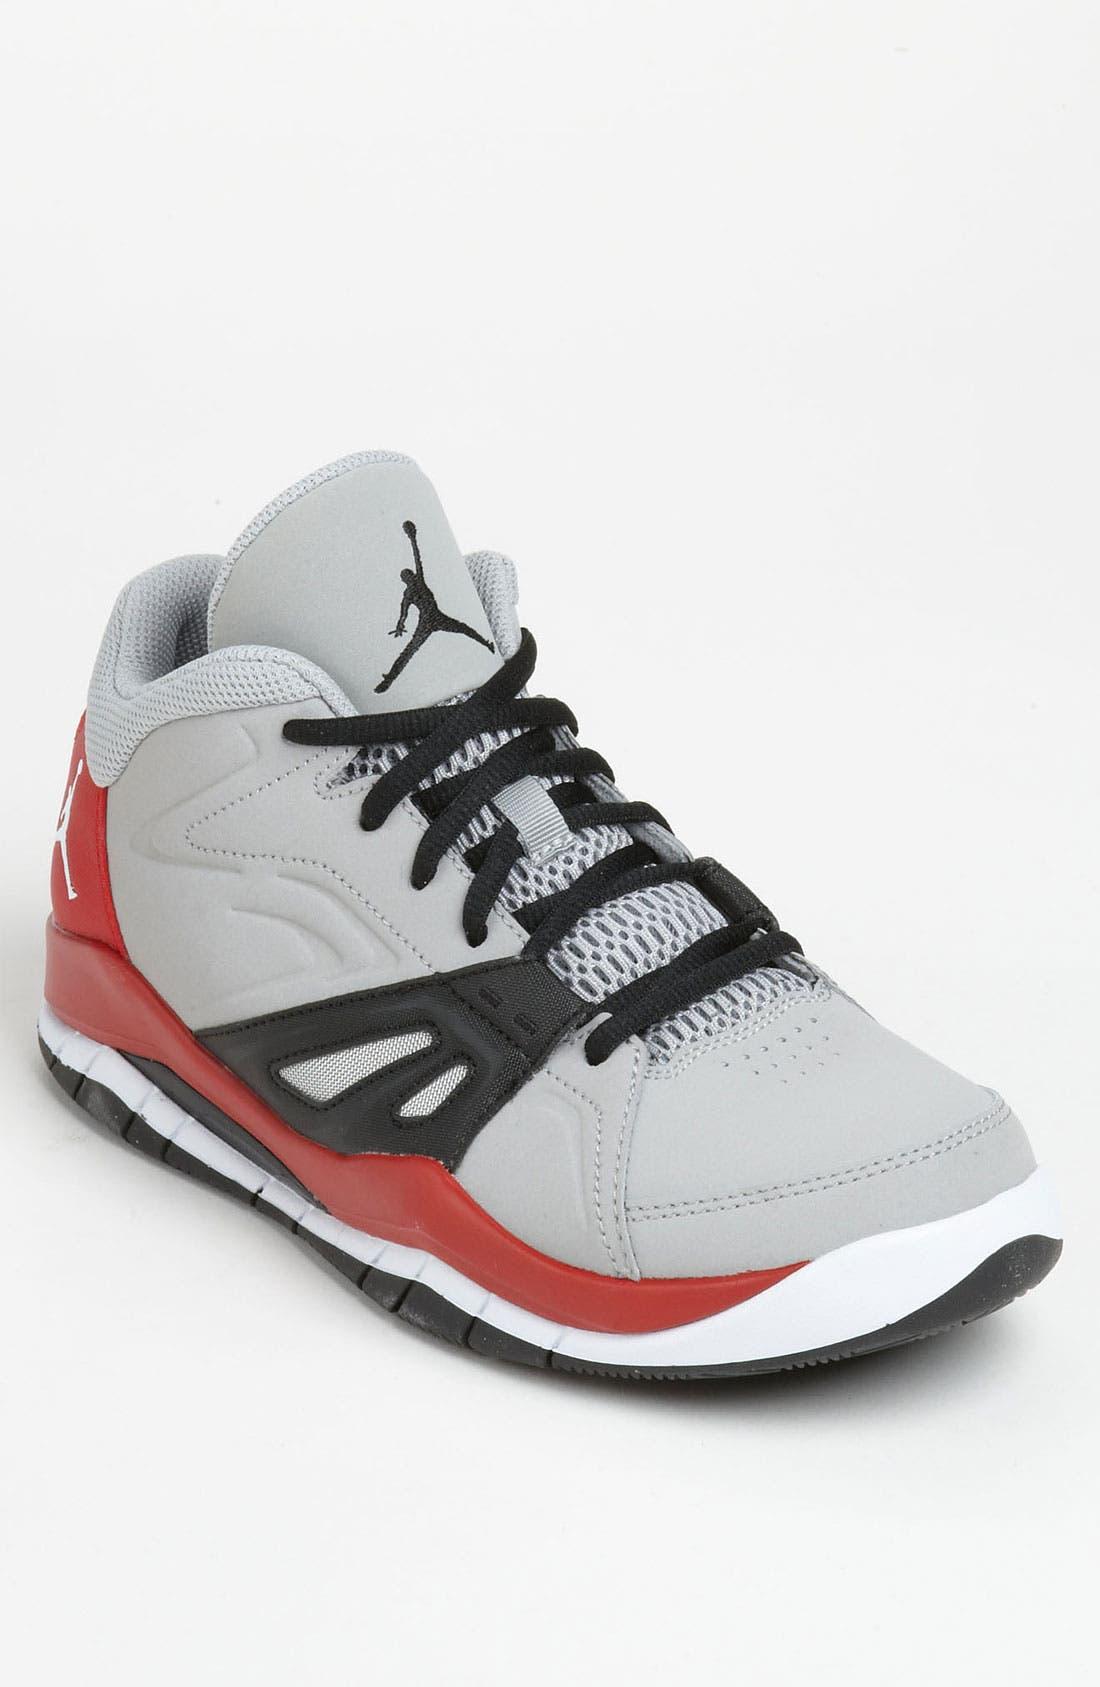 Main Image - Nike 'Jordan Ace 23' Basketball Shoe (Big Kid)